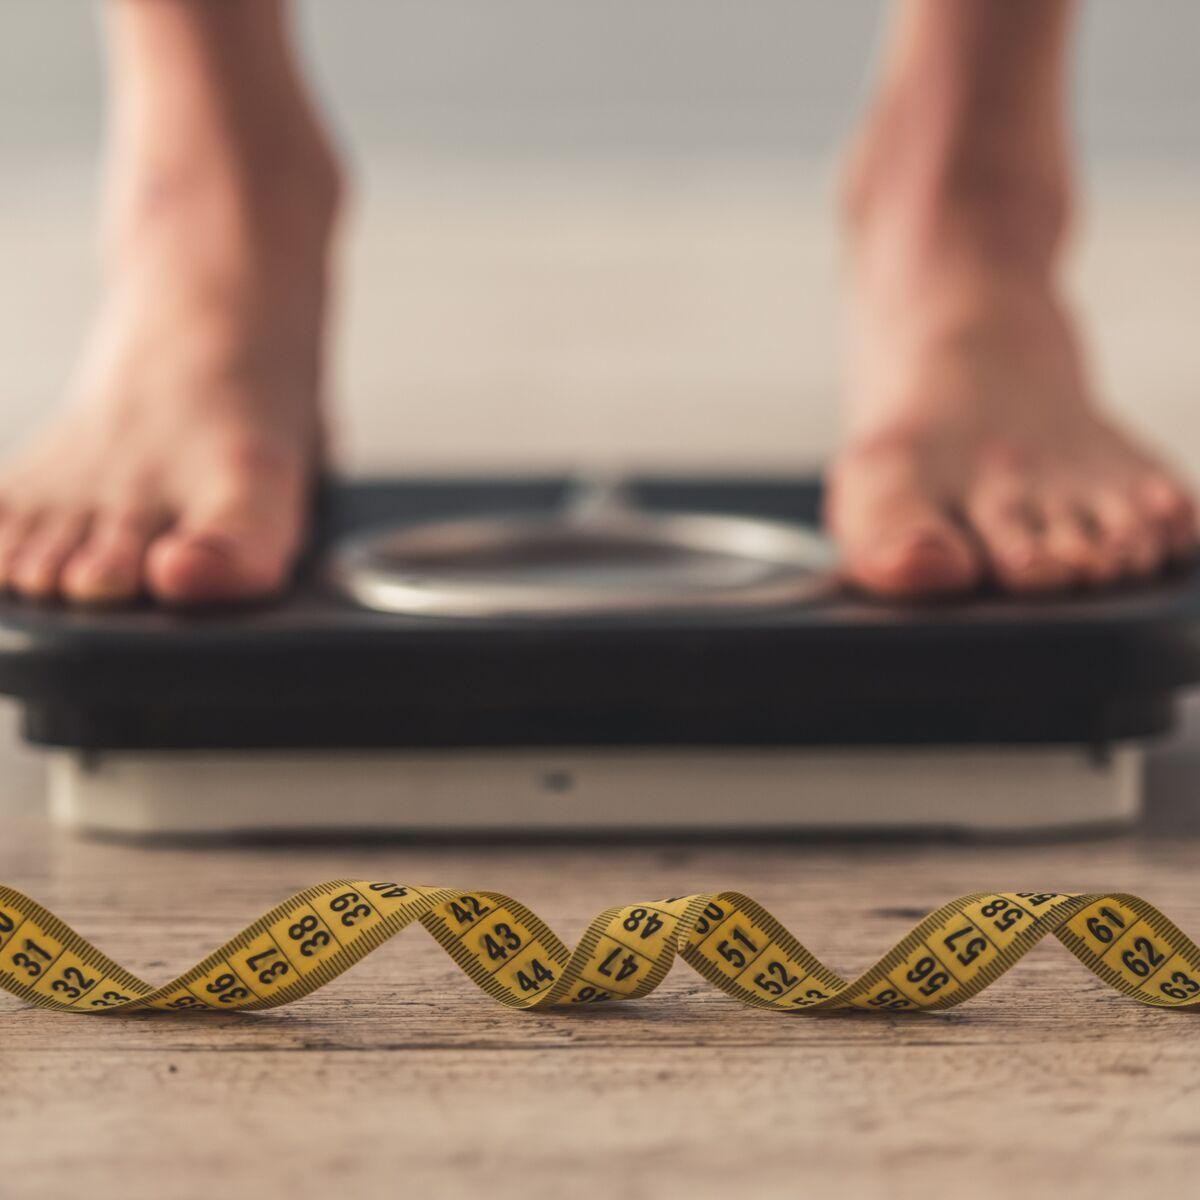 Défi de perte de poids de 35 jours endocrinologue de perte de poids miami